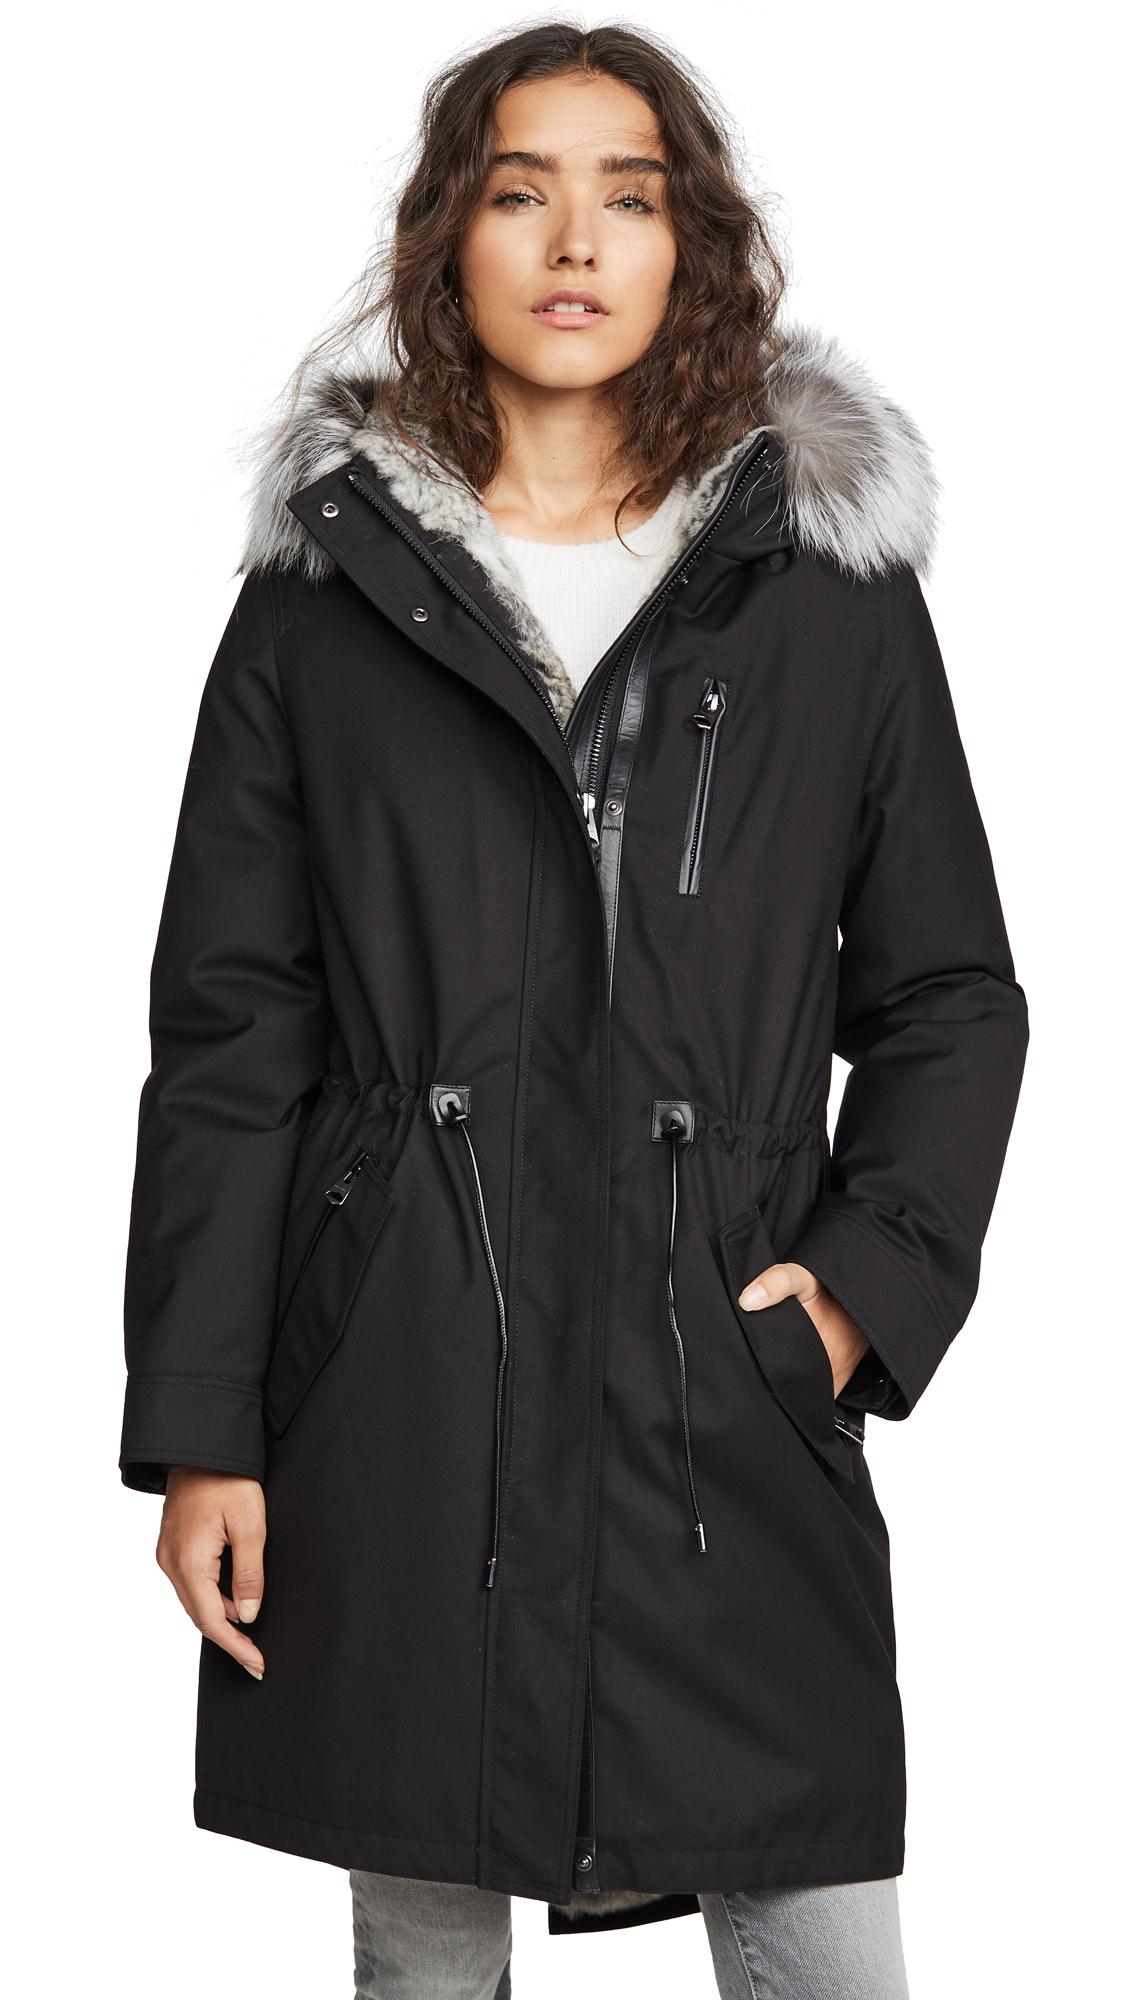 Buy Mackage Rena Parka online beautiful Mackage Jackets, Coats, Down Jackets